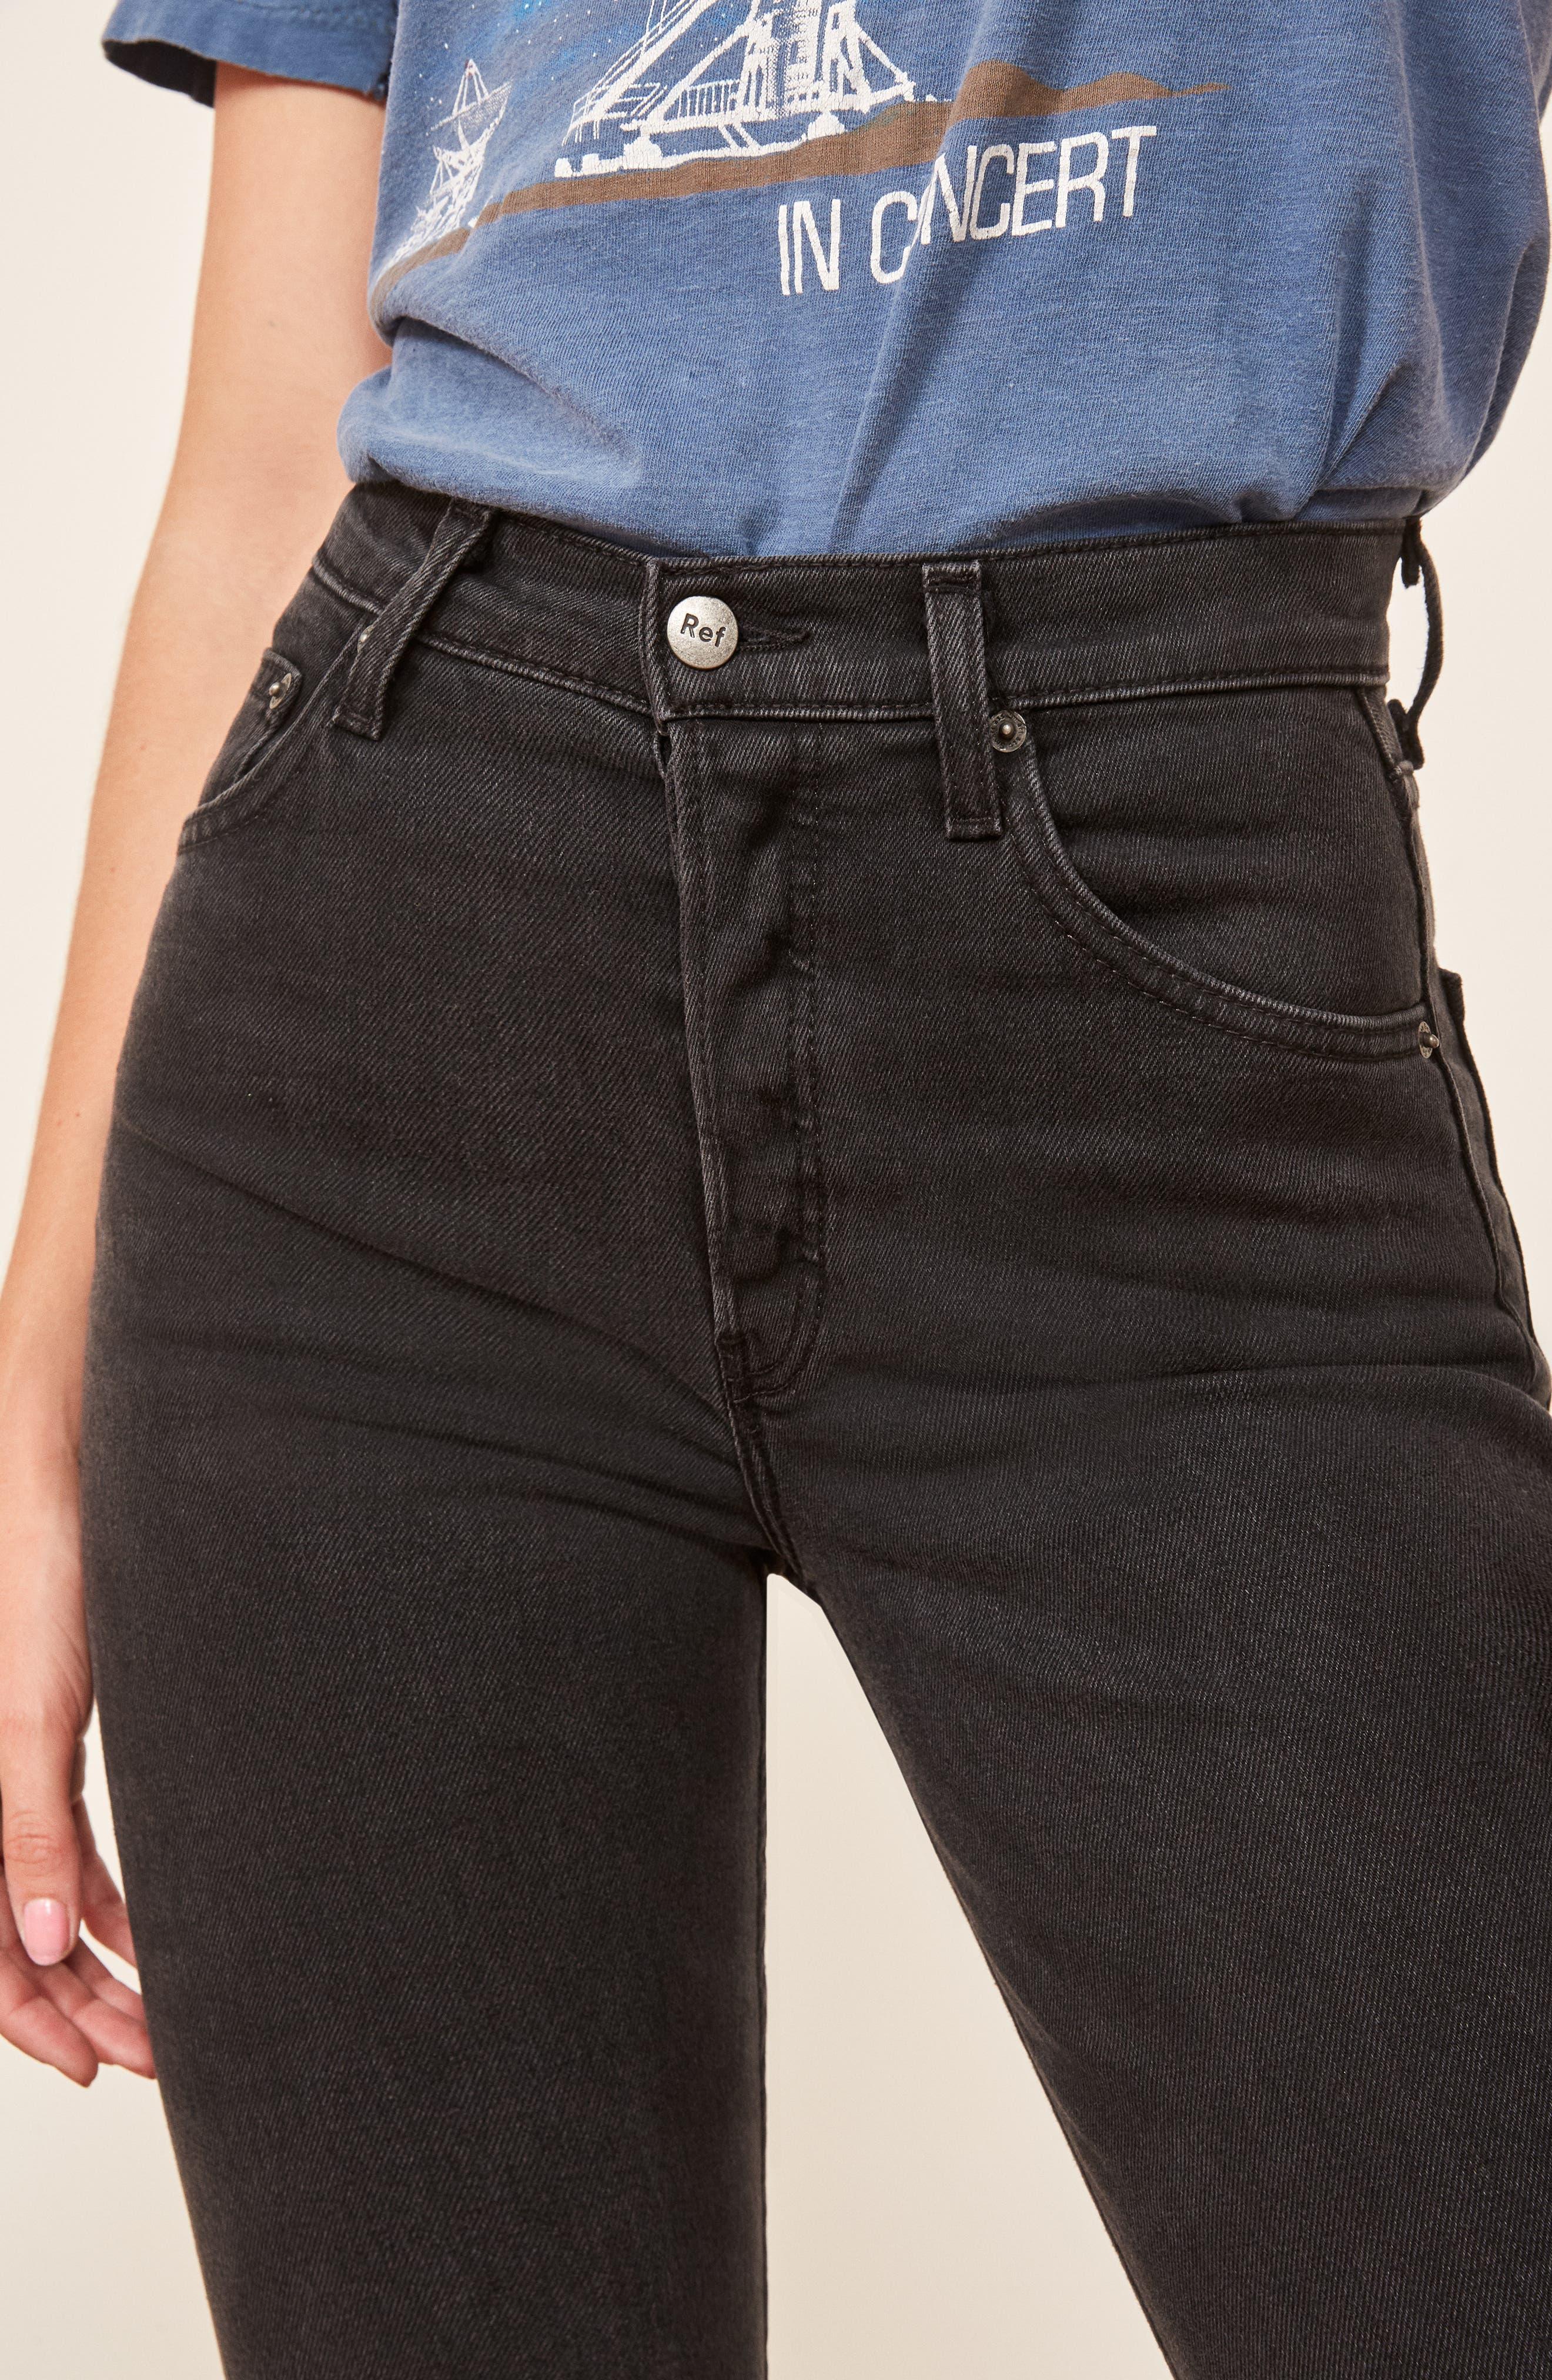 Serena High Waist Skinny Jeans,                             Alternate thumbnail 3, color,                             ARGENTINE